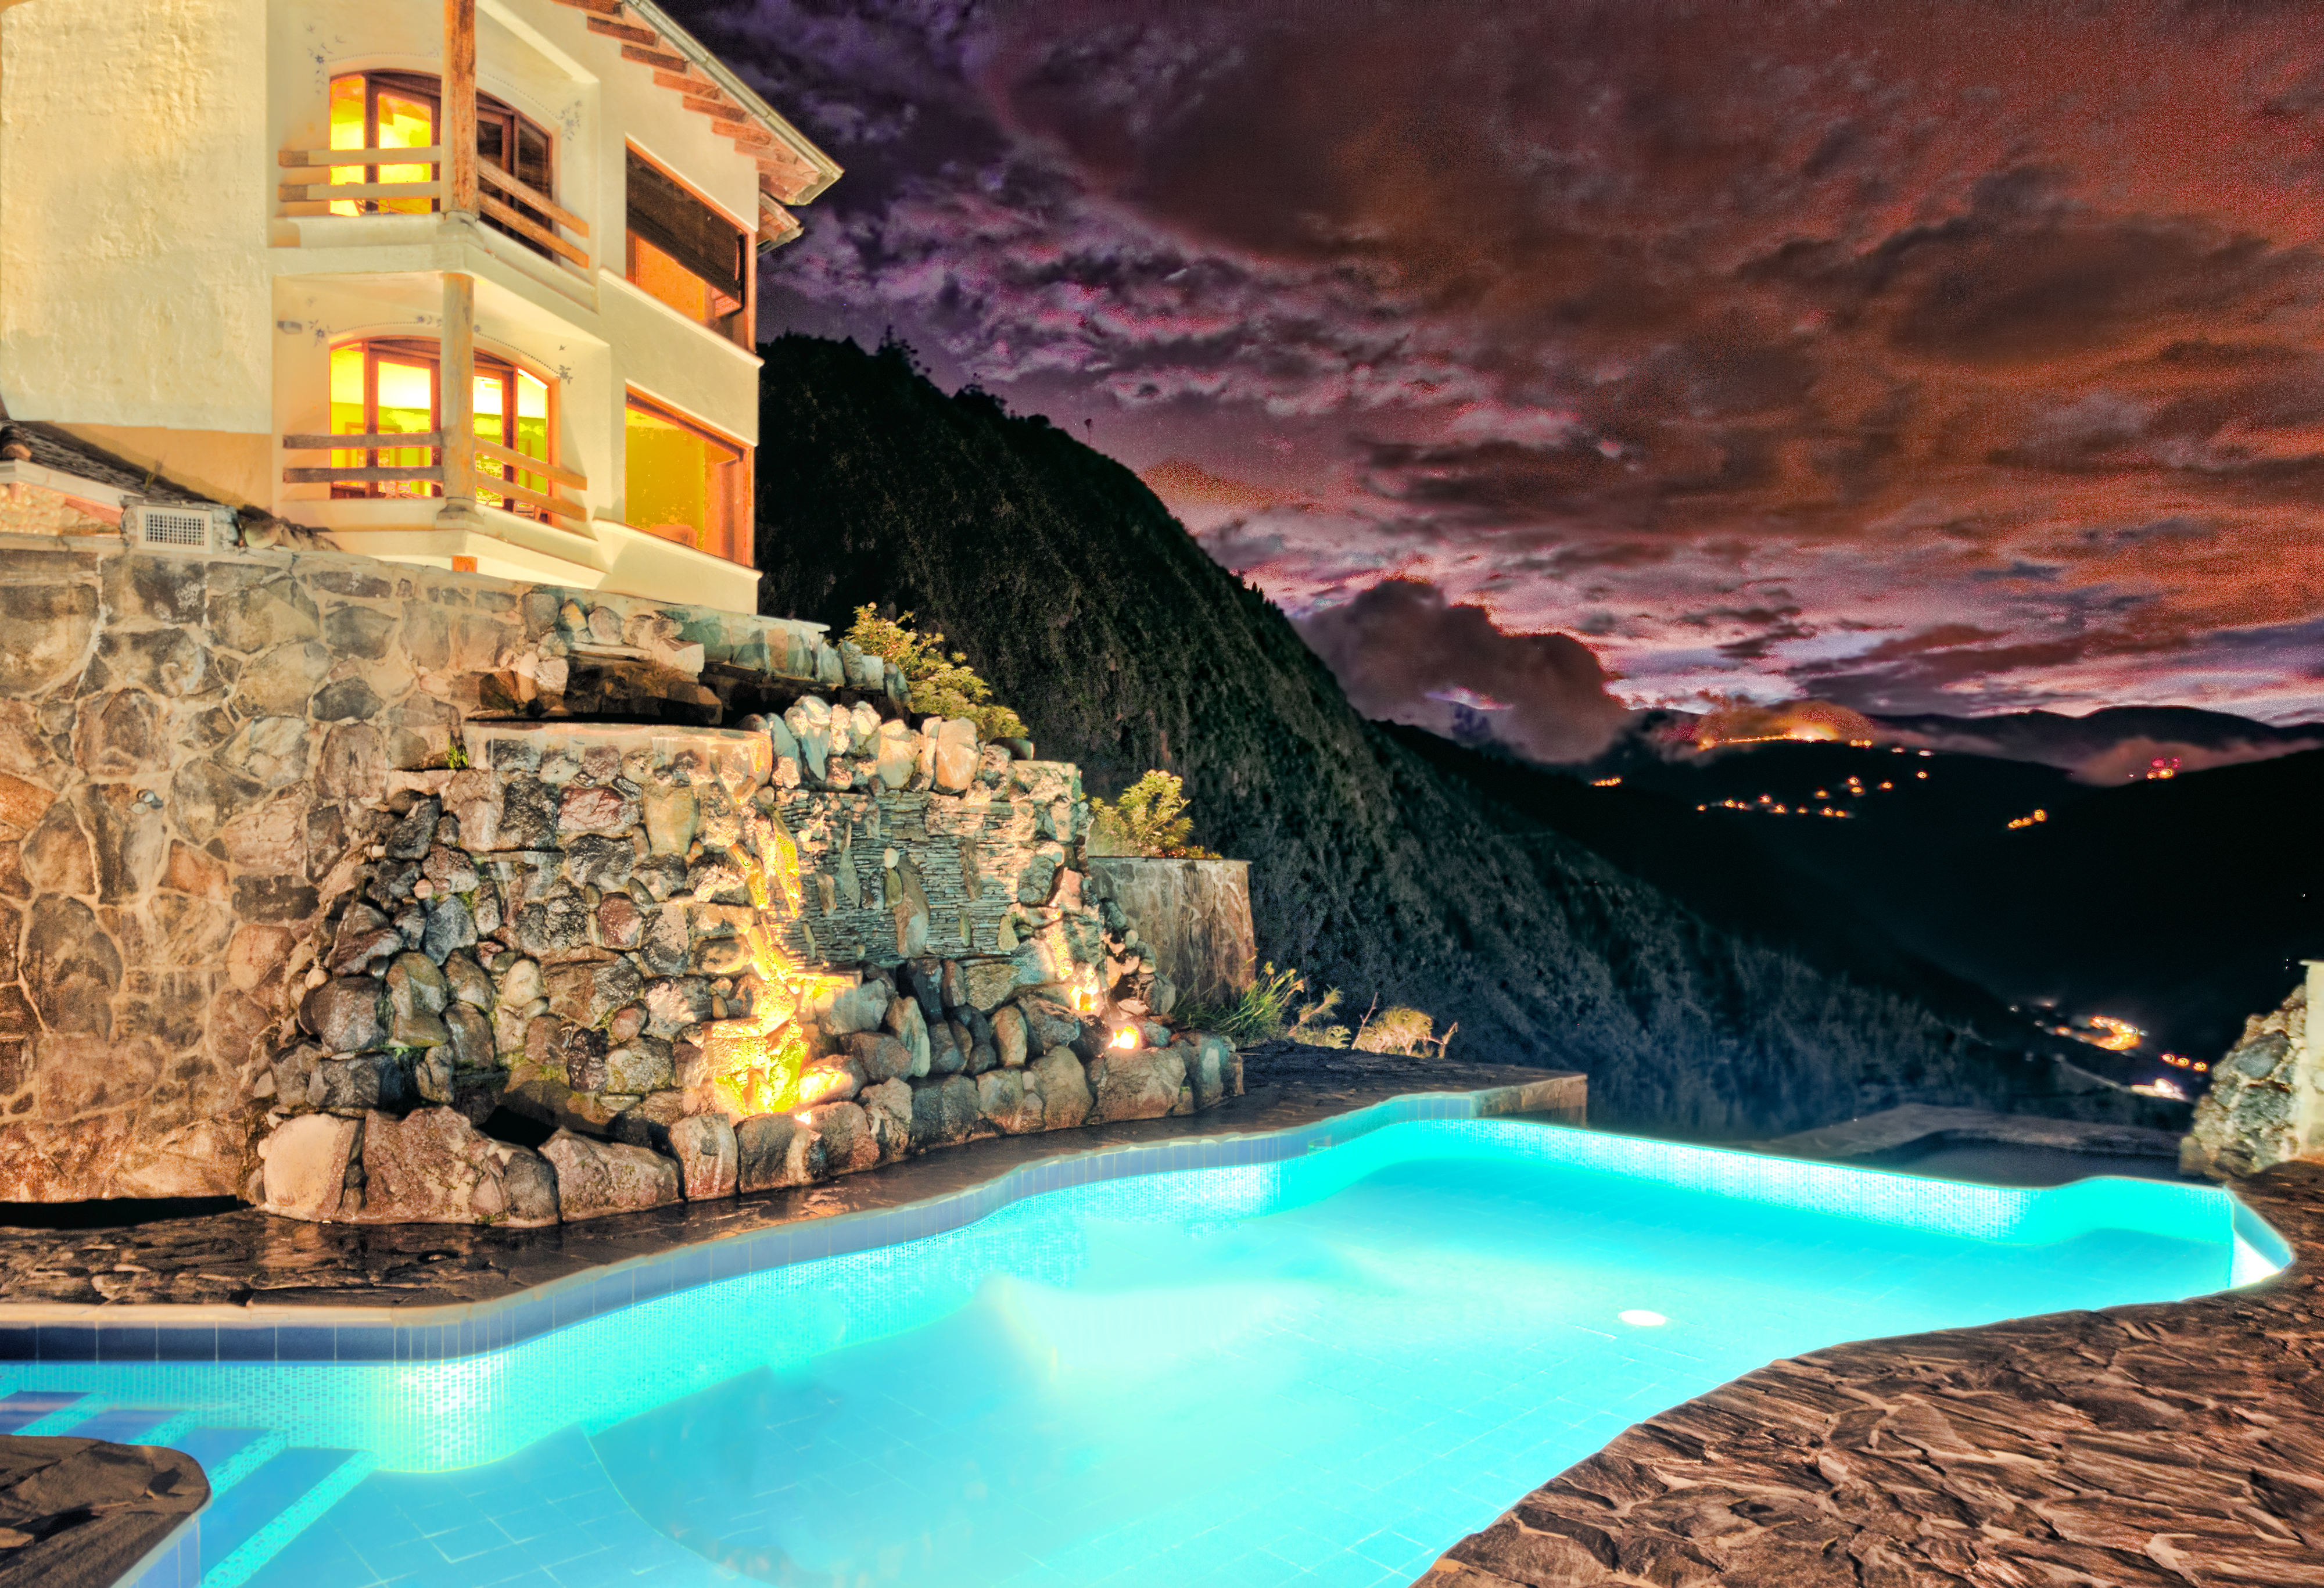 Luna Runtun Adventure SPA Tungurahua Ecuador Informaci n Tur stica